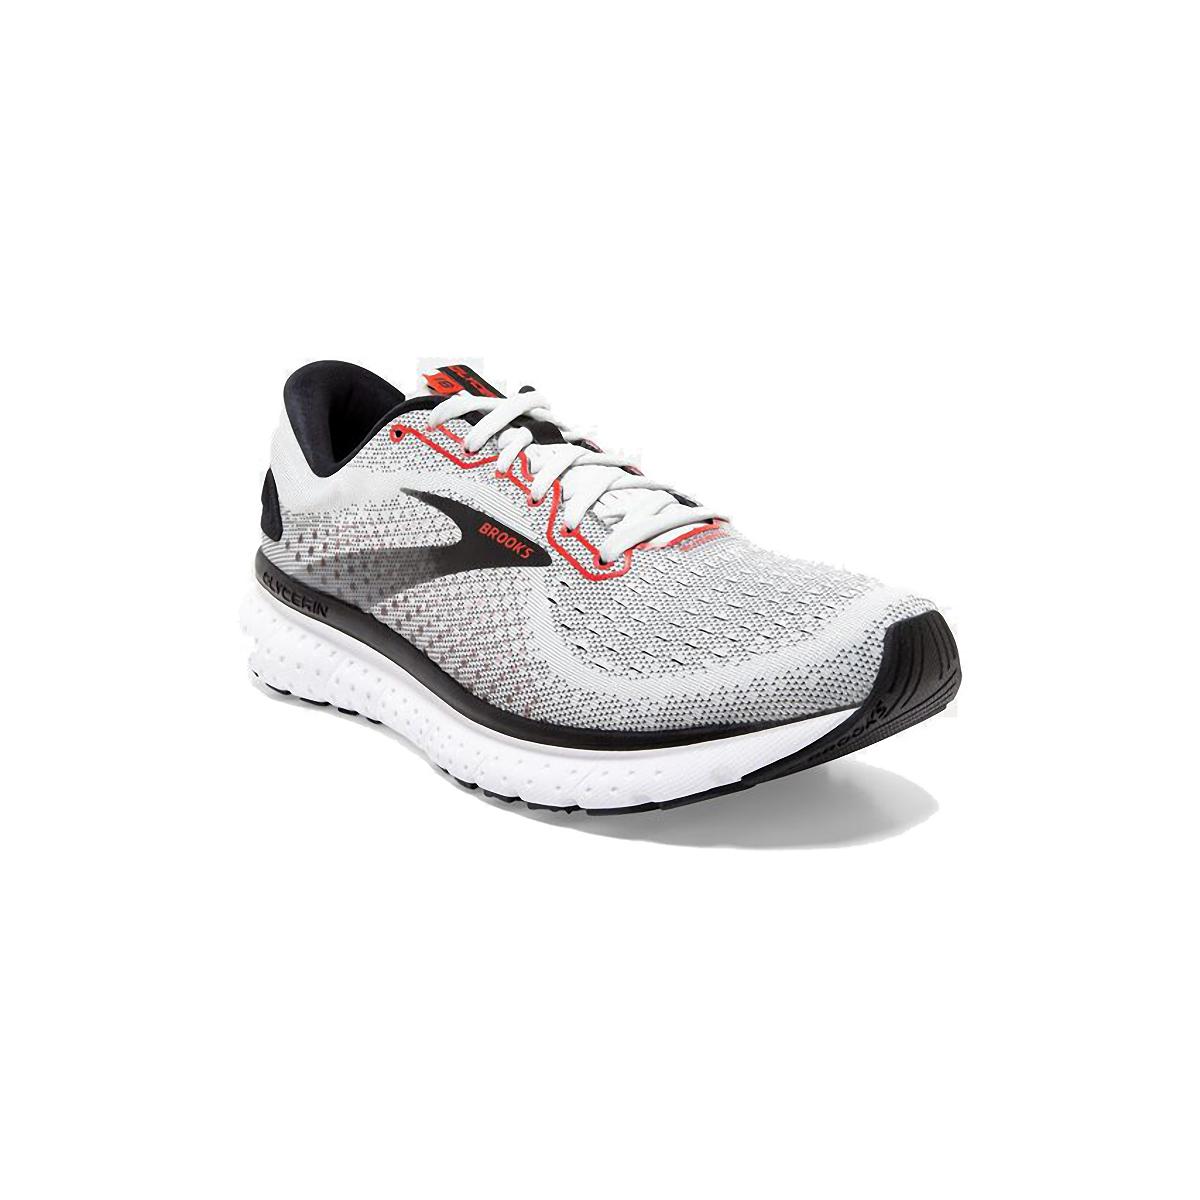 Men's Brooks Glycerin 18 Running Shoe - Color: White/Black/Red - Size: 7 - Width: Regular, White/Black/Red, large, image 4